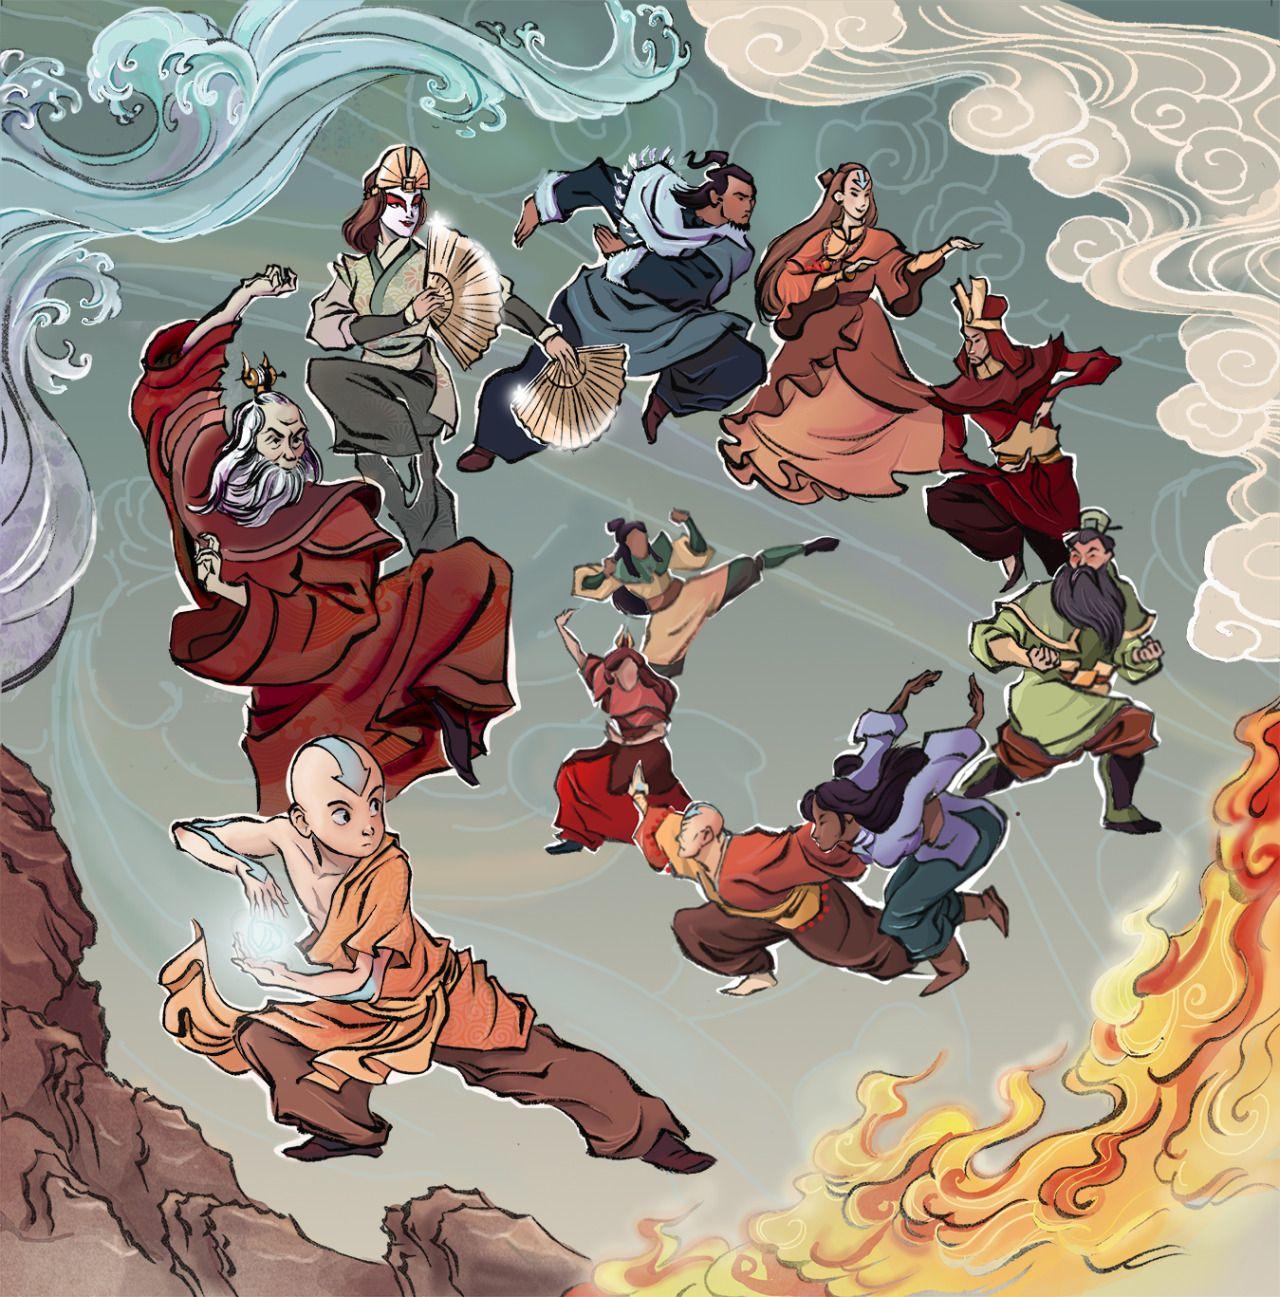 Avatar Aang: Avatar, Avatar Airbender, Avatar